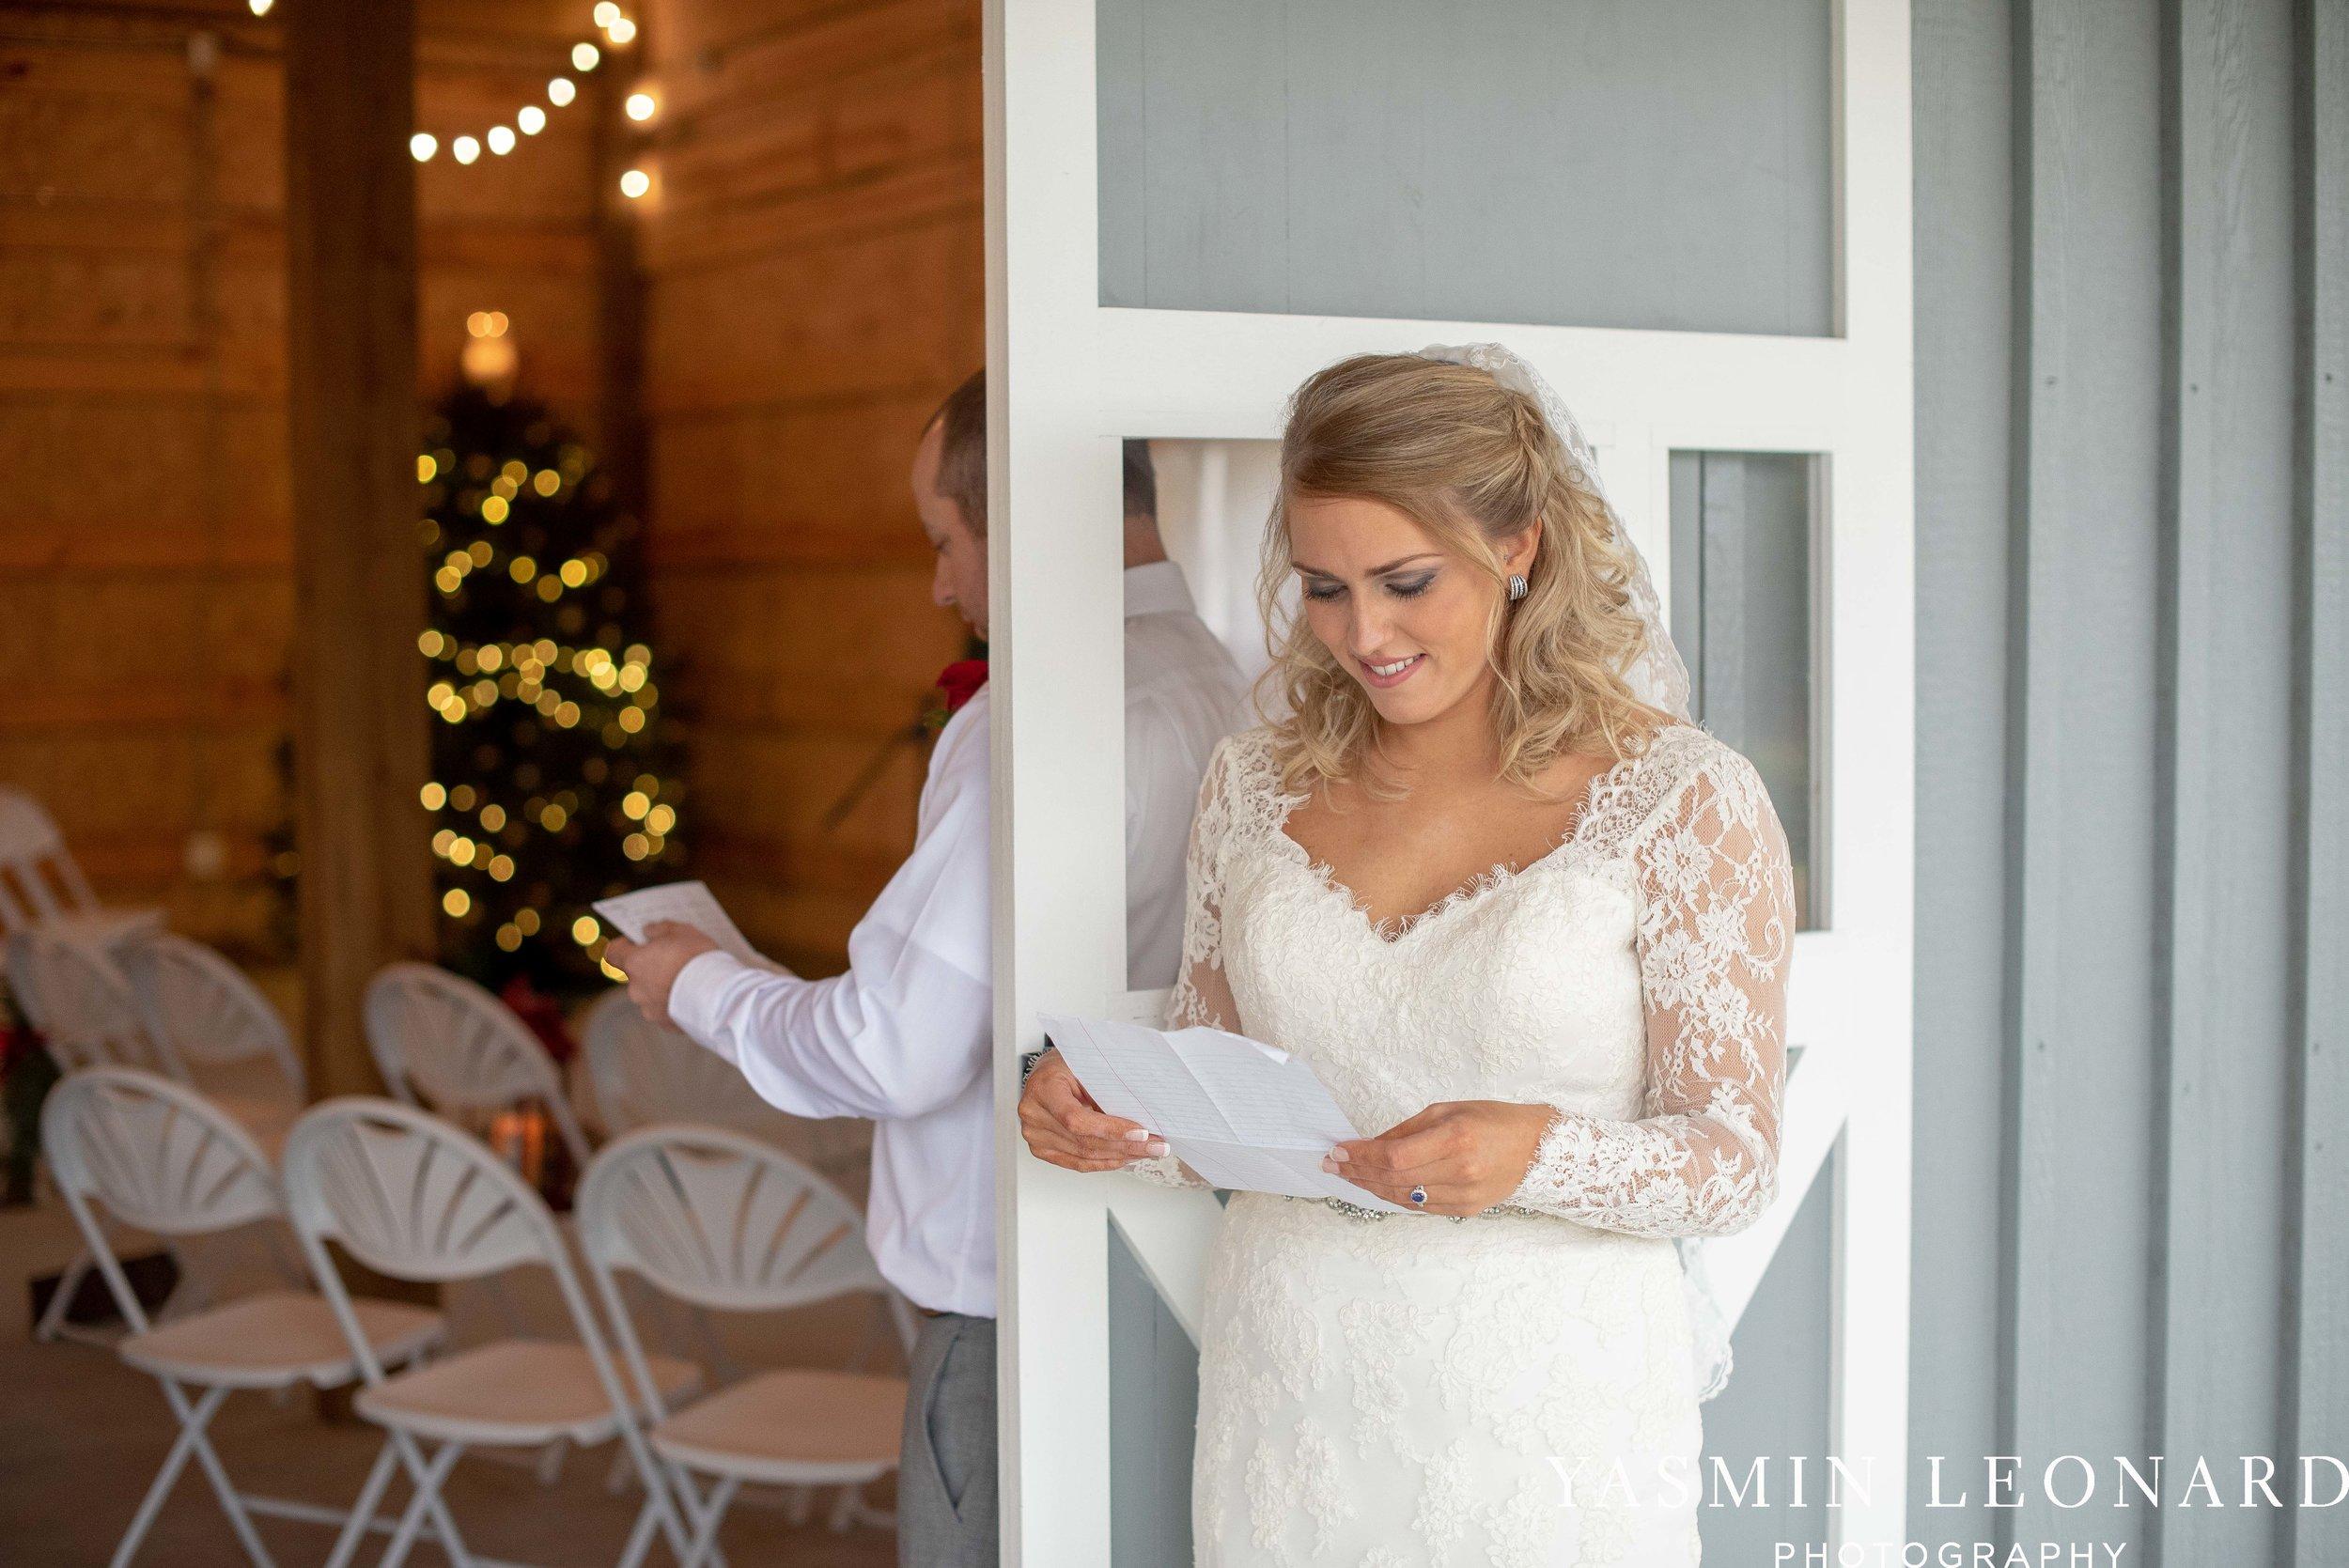 Secret Meadows at Green Dell Farm, NC Barns, NC Wedding Venues, Triad, NC, NC Wedding Photography, Triad Wedding Venues, Affordable Wedding Venues, NEW Wedding Venues, Christmas Weddings-15.jpg